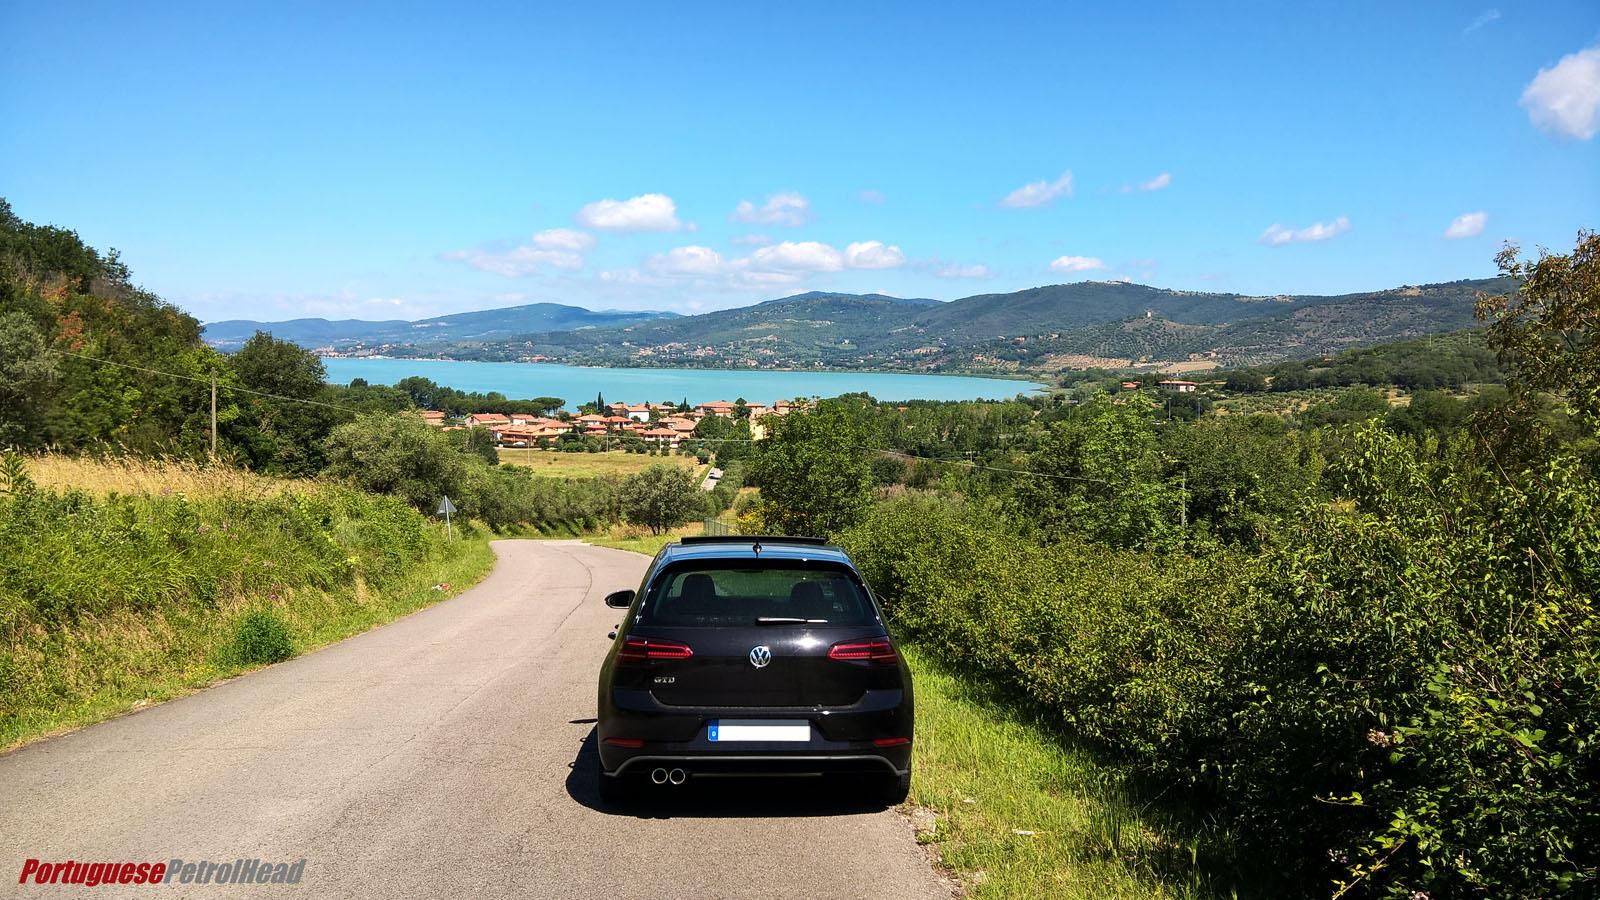 Portuguese Petrol Head: July 2018